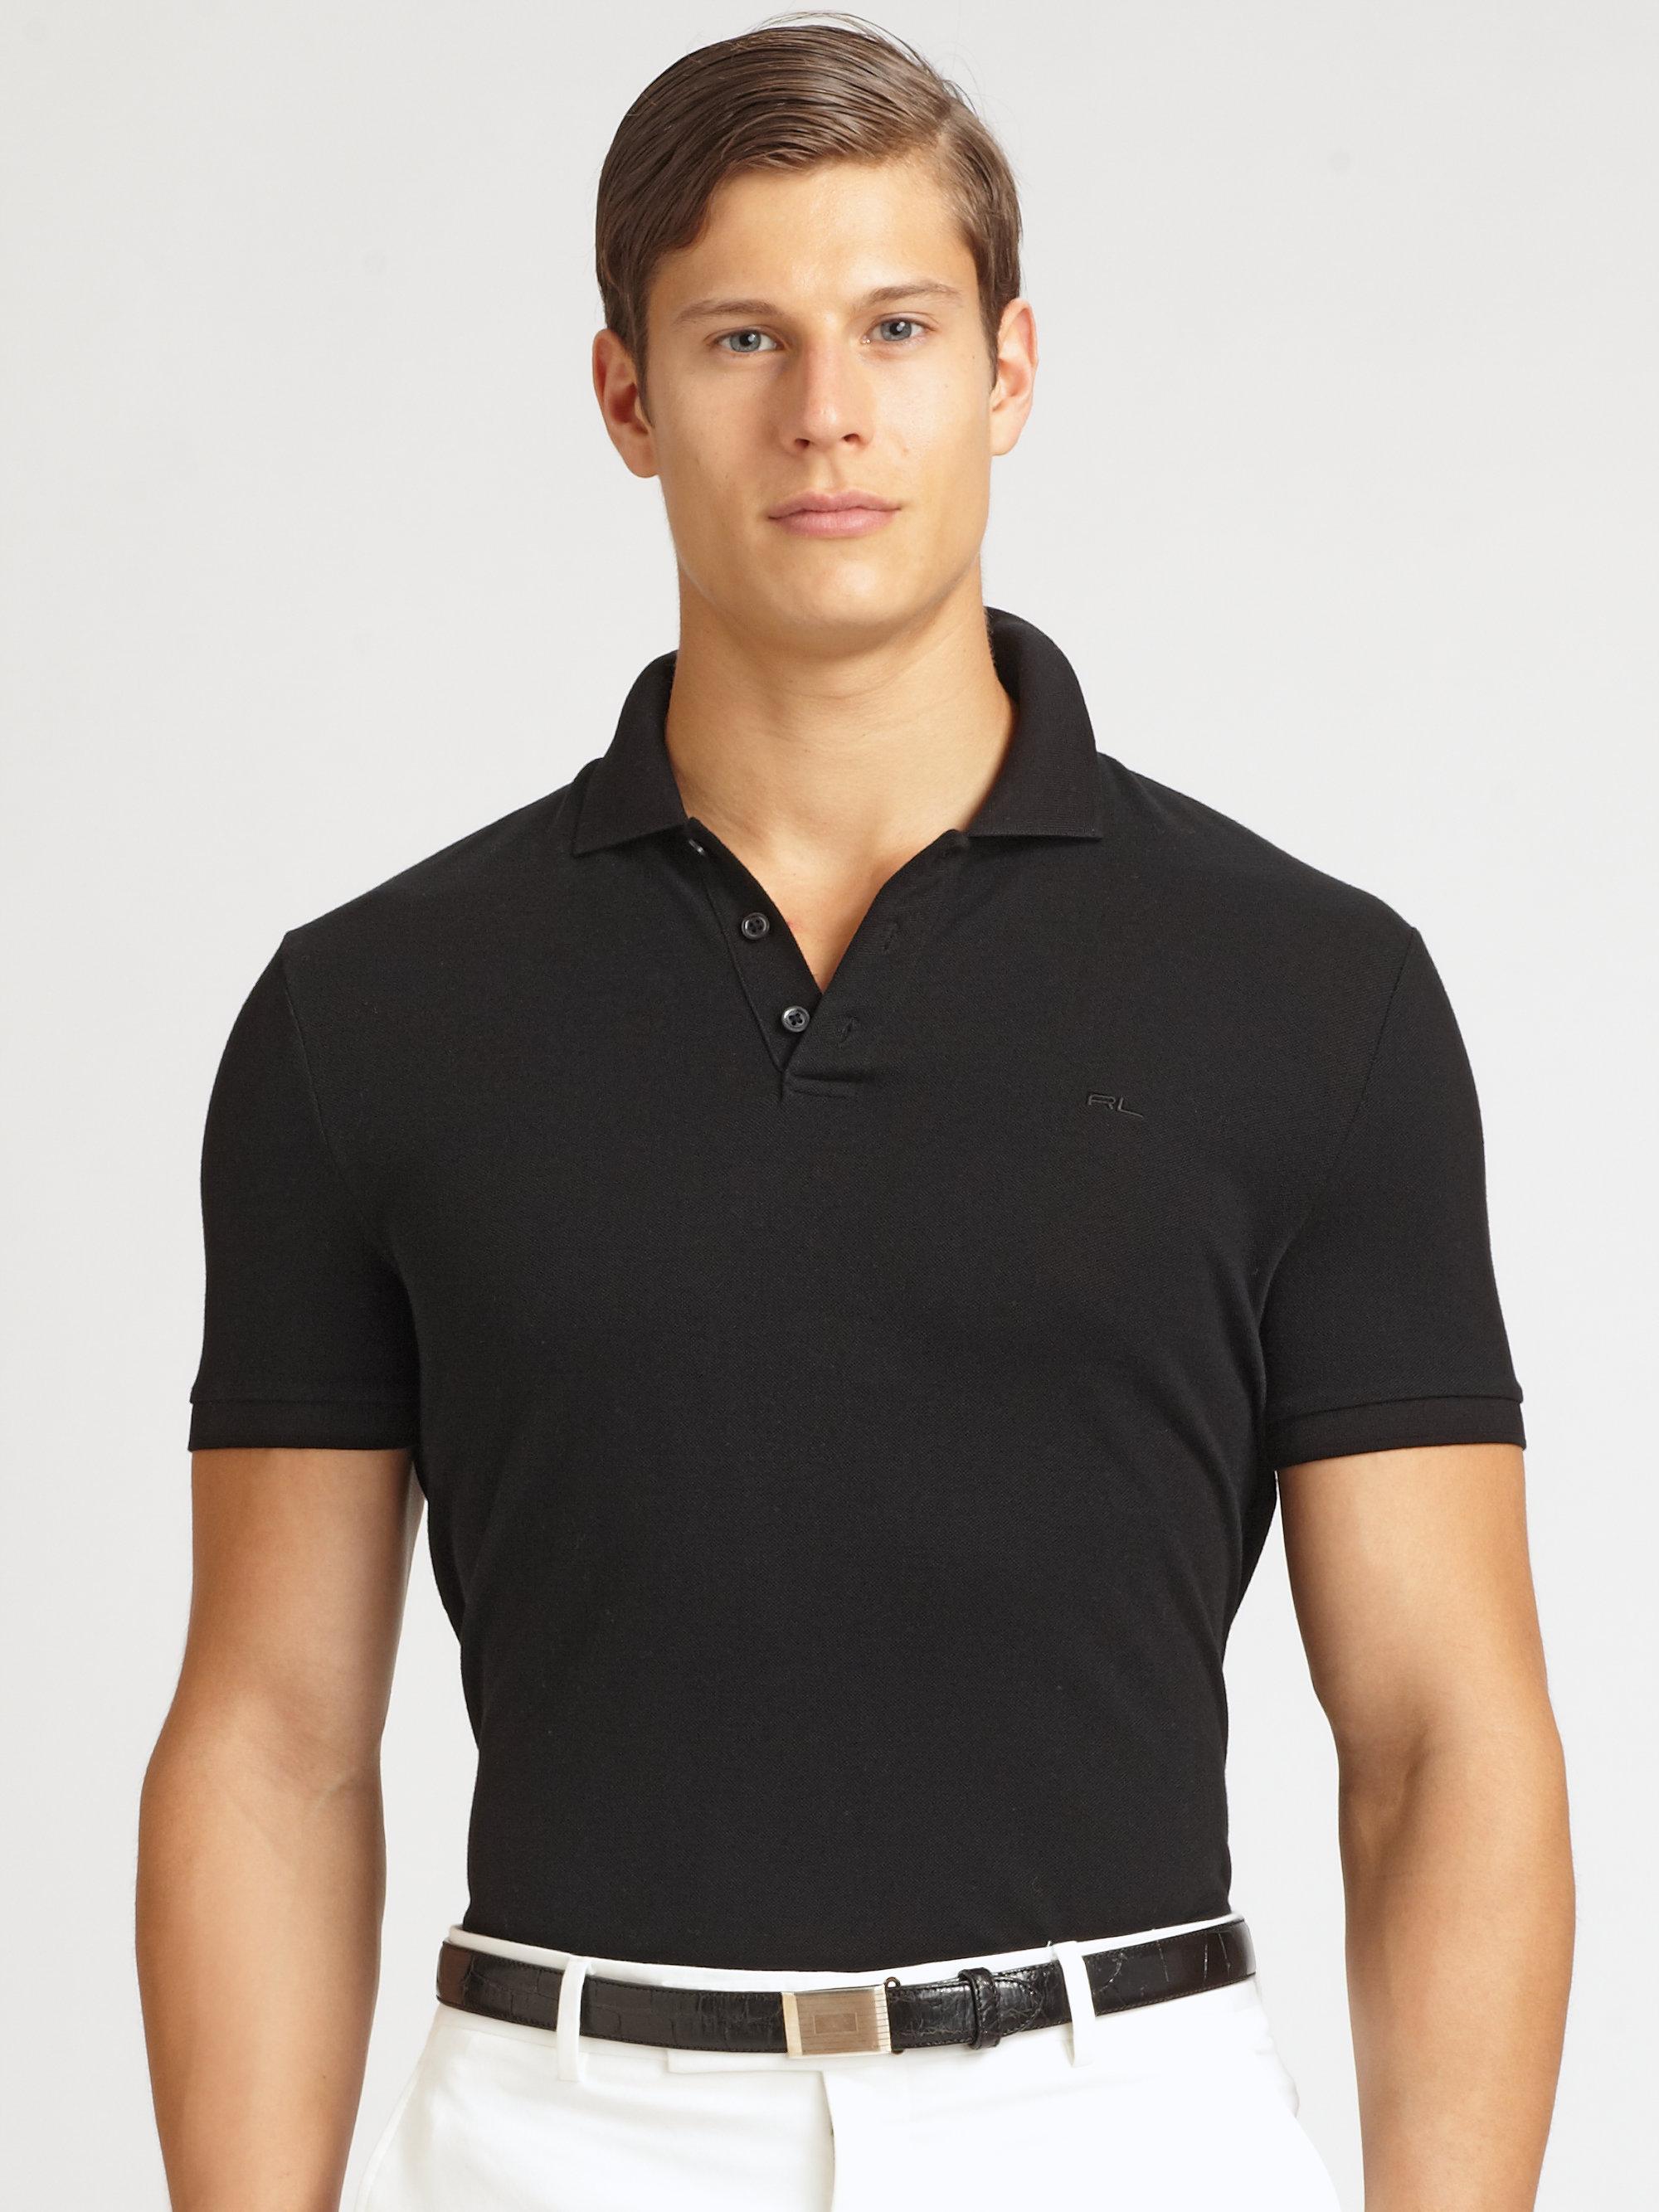 Ralph lauren black label solid mesh knit polo in black for for Ralph lauren black label polo shirt